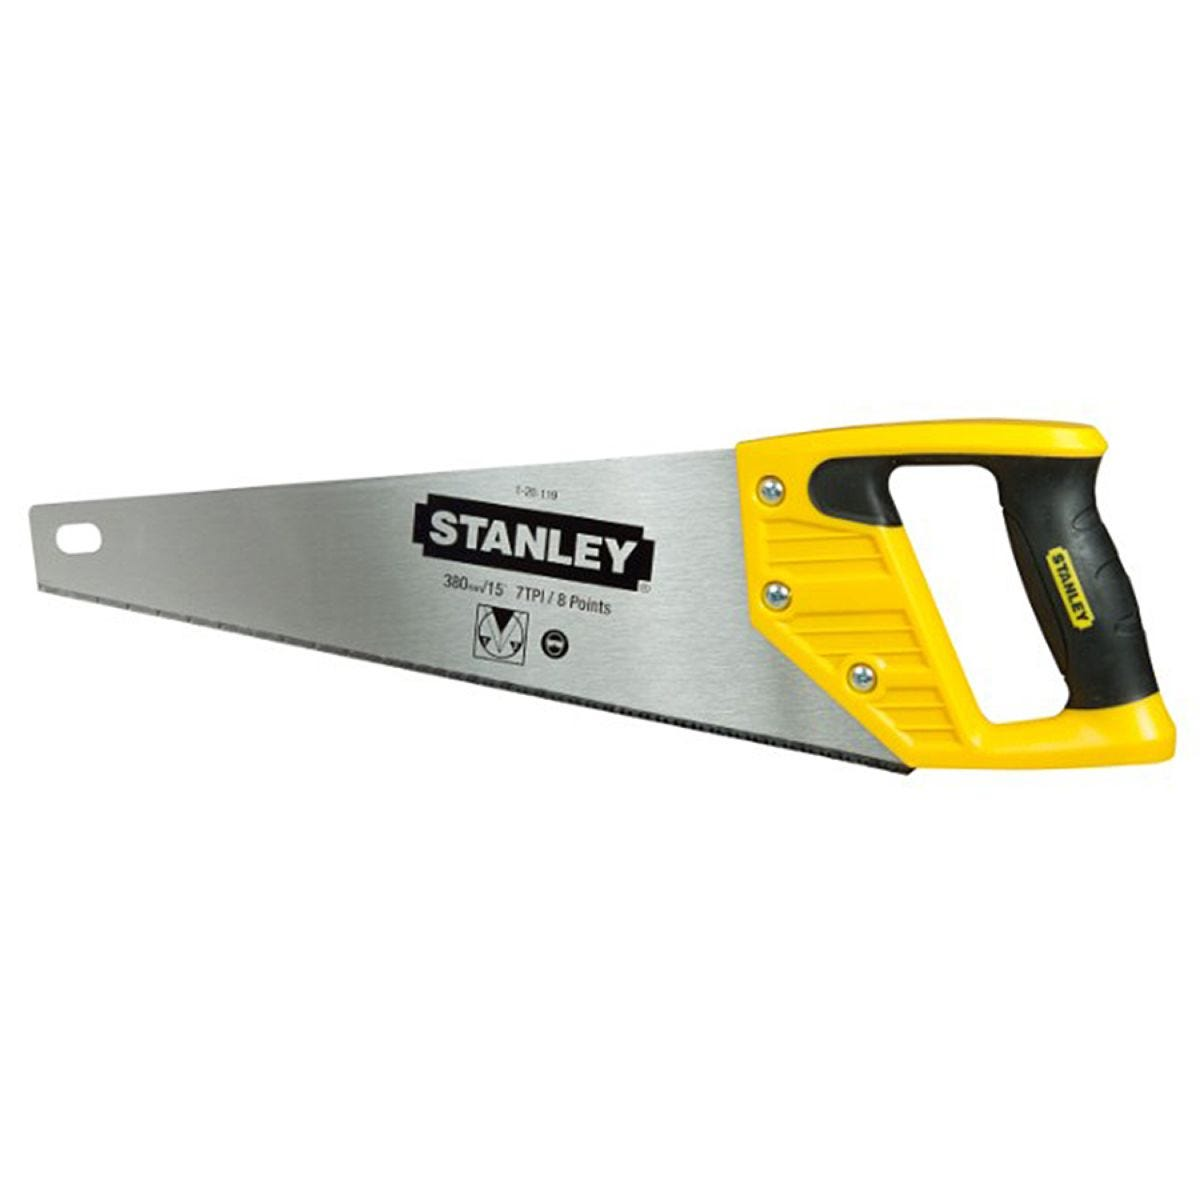 Stanley Jetcut 380mm Saw